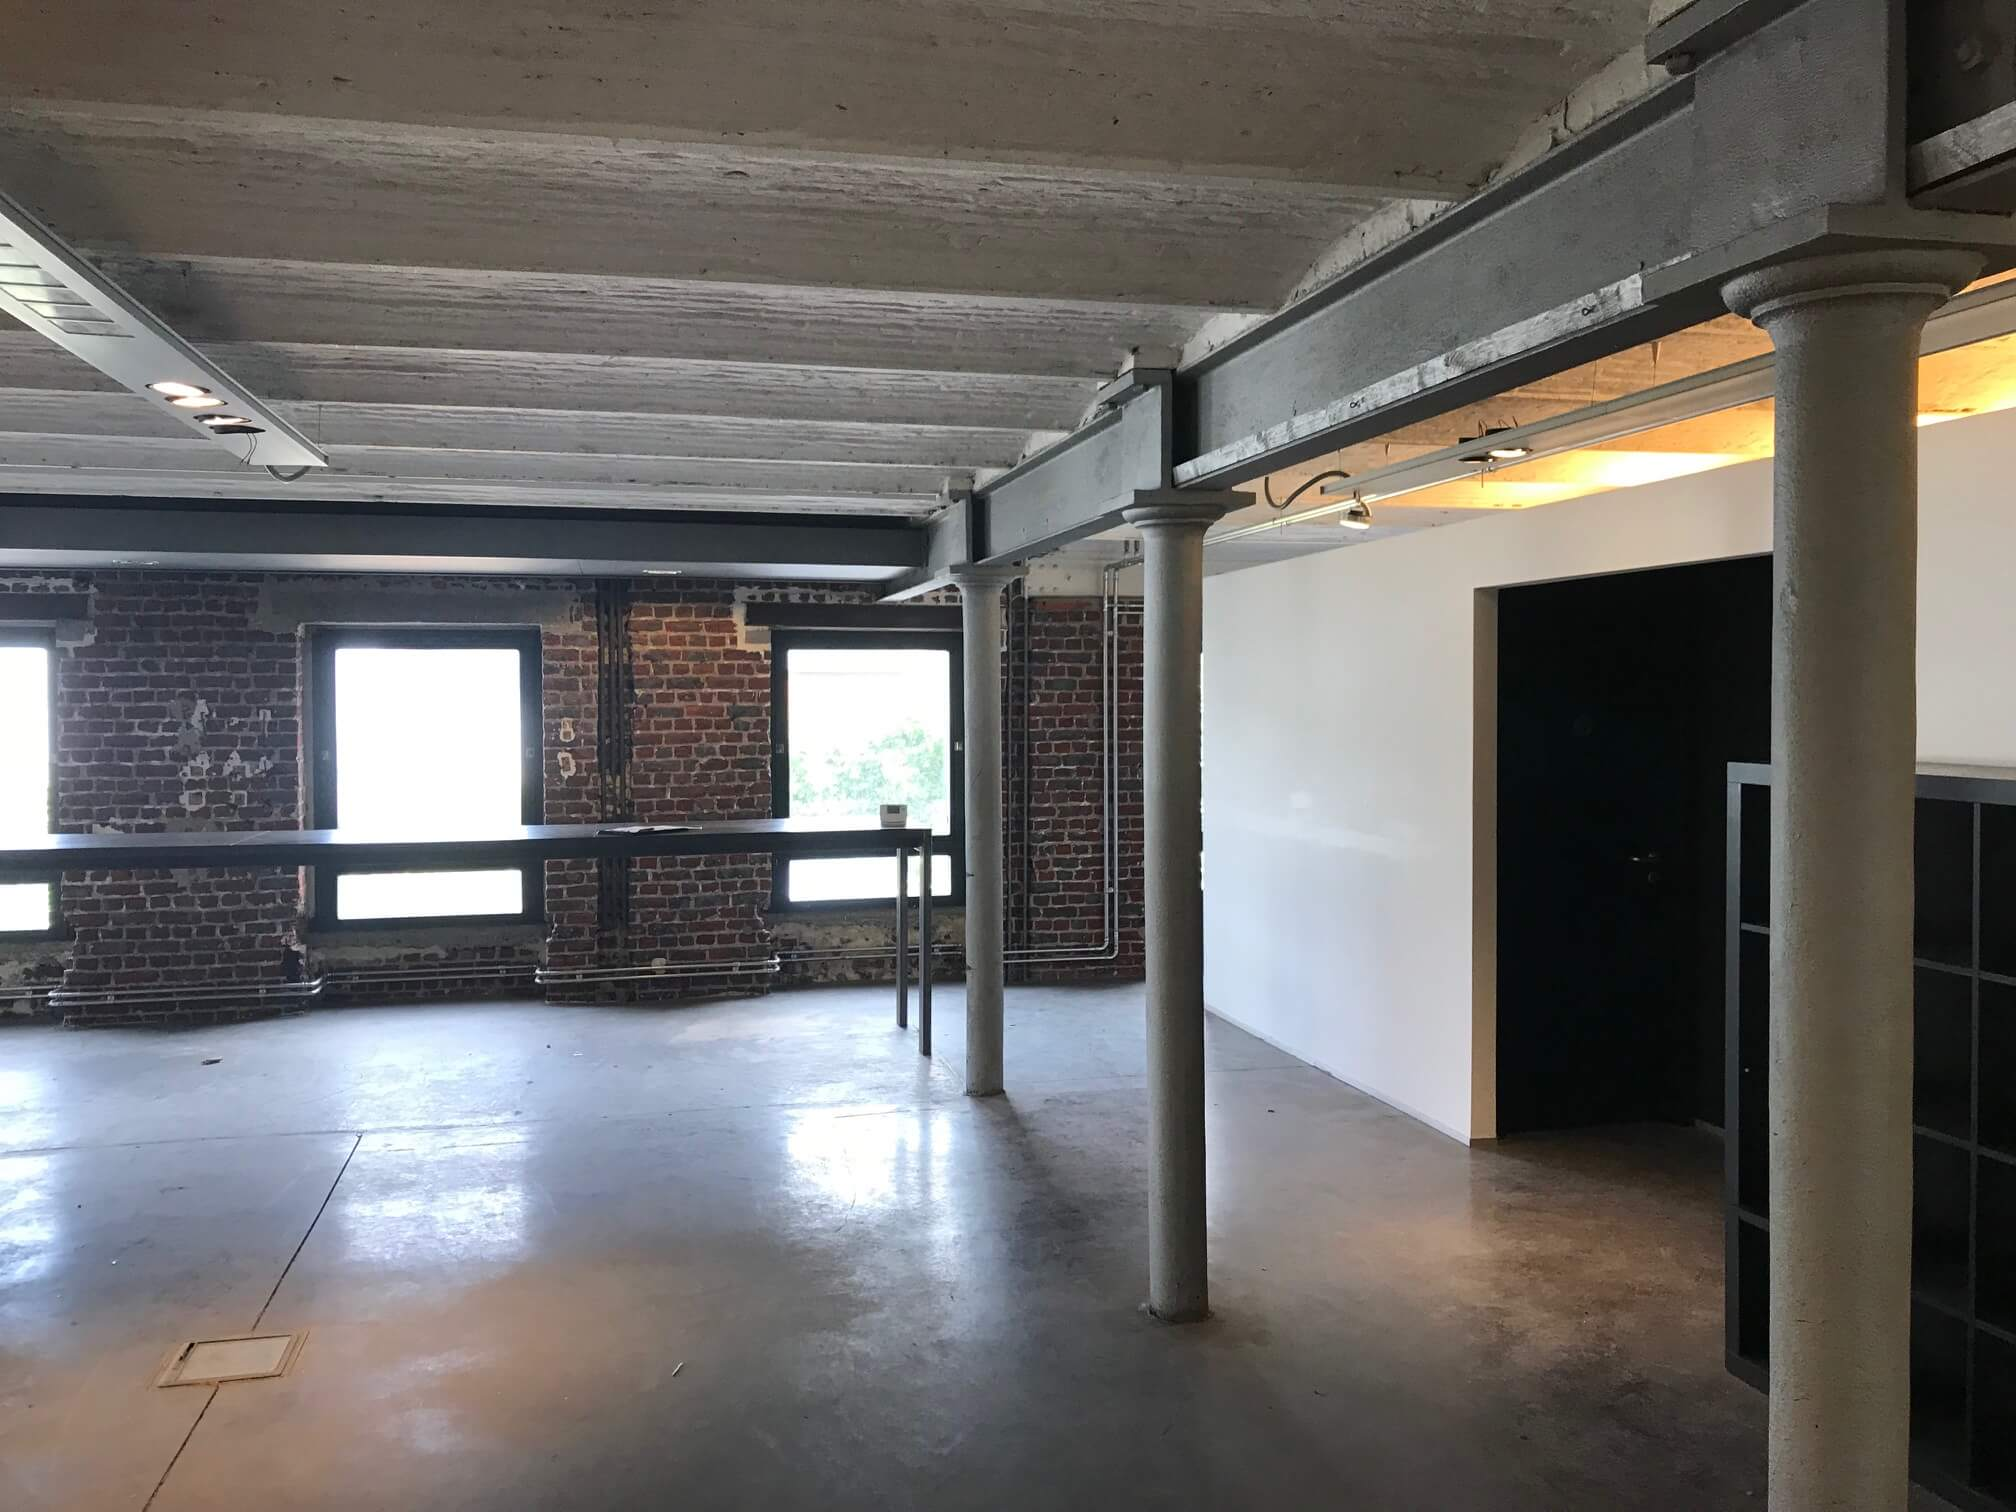 bureau-bricks-elec-galerie-electricite-vanhoyesprl